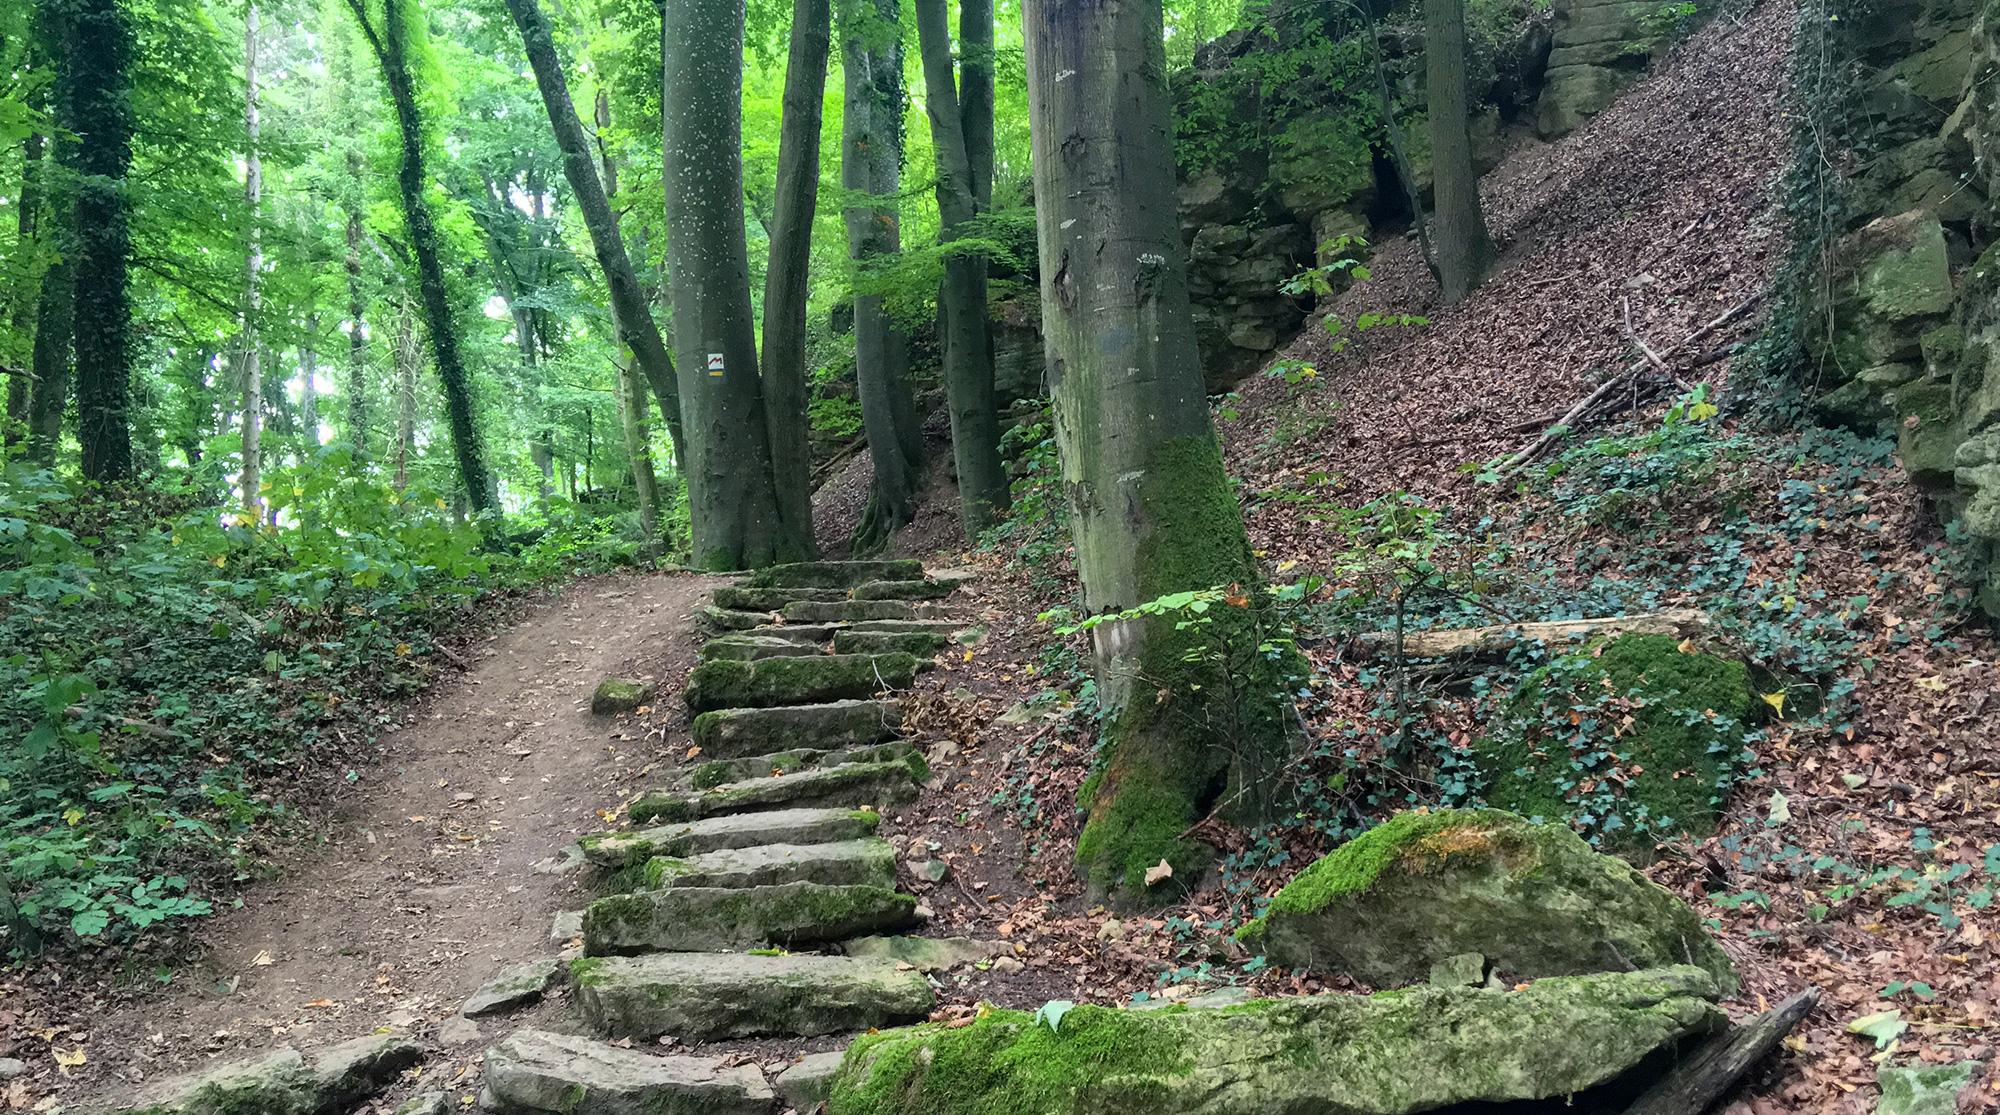 Felstreppen im Wald am Roudescgleff Felsen